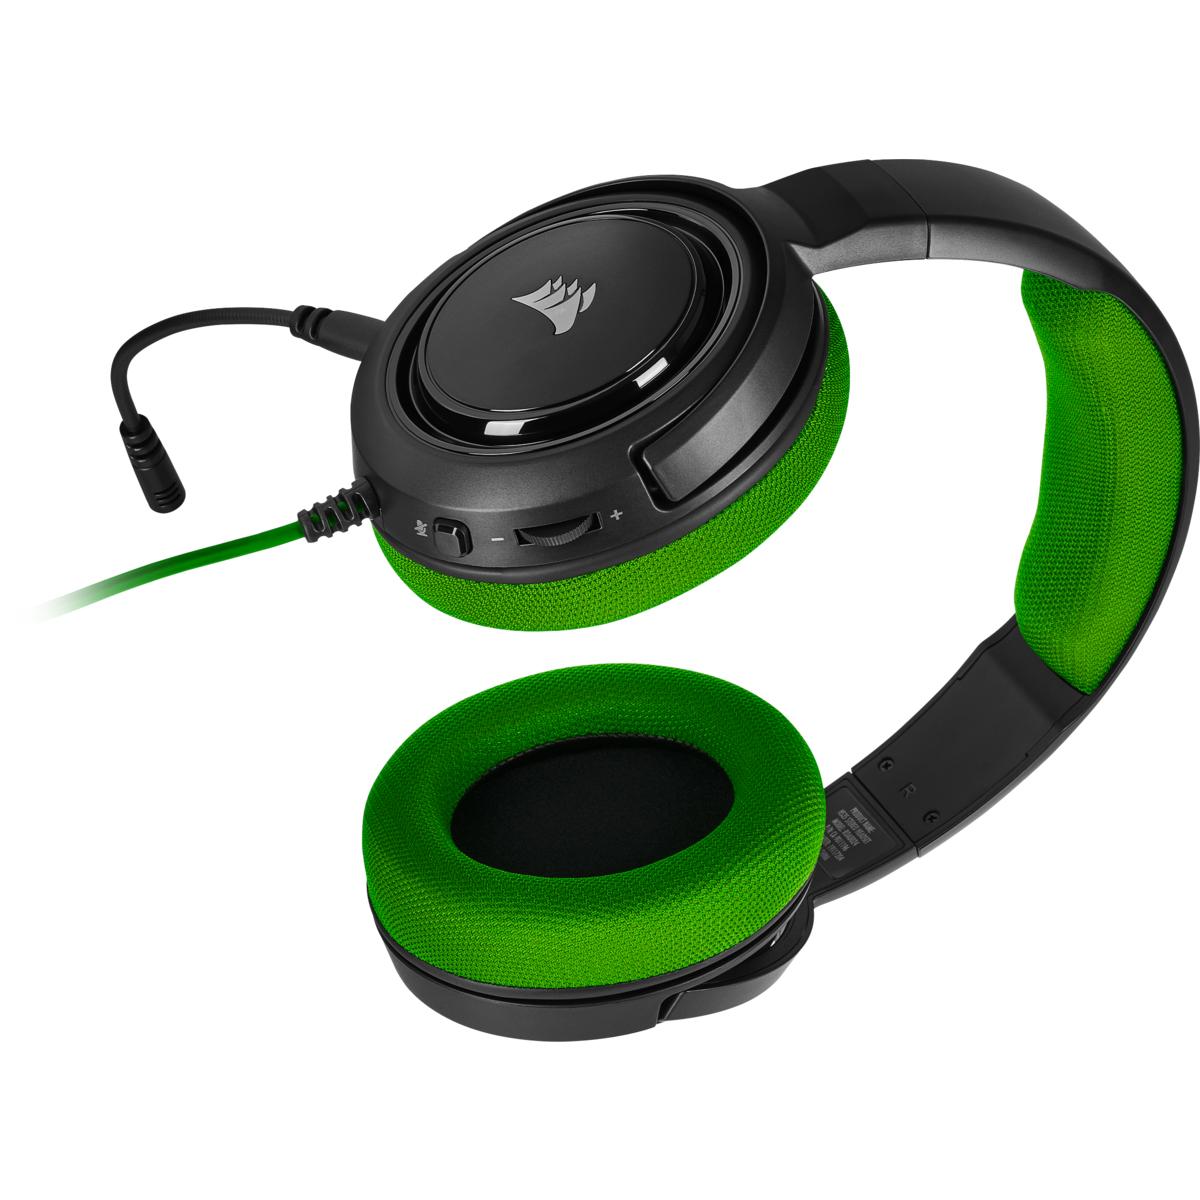 Hs35 Auriculares Diadema Negro, Verde